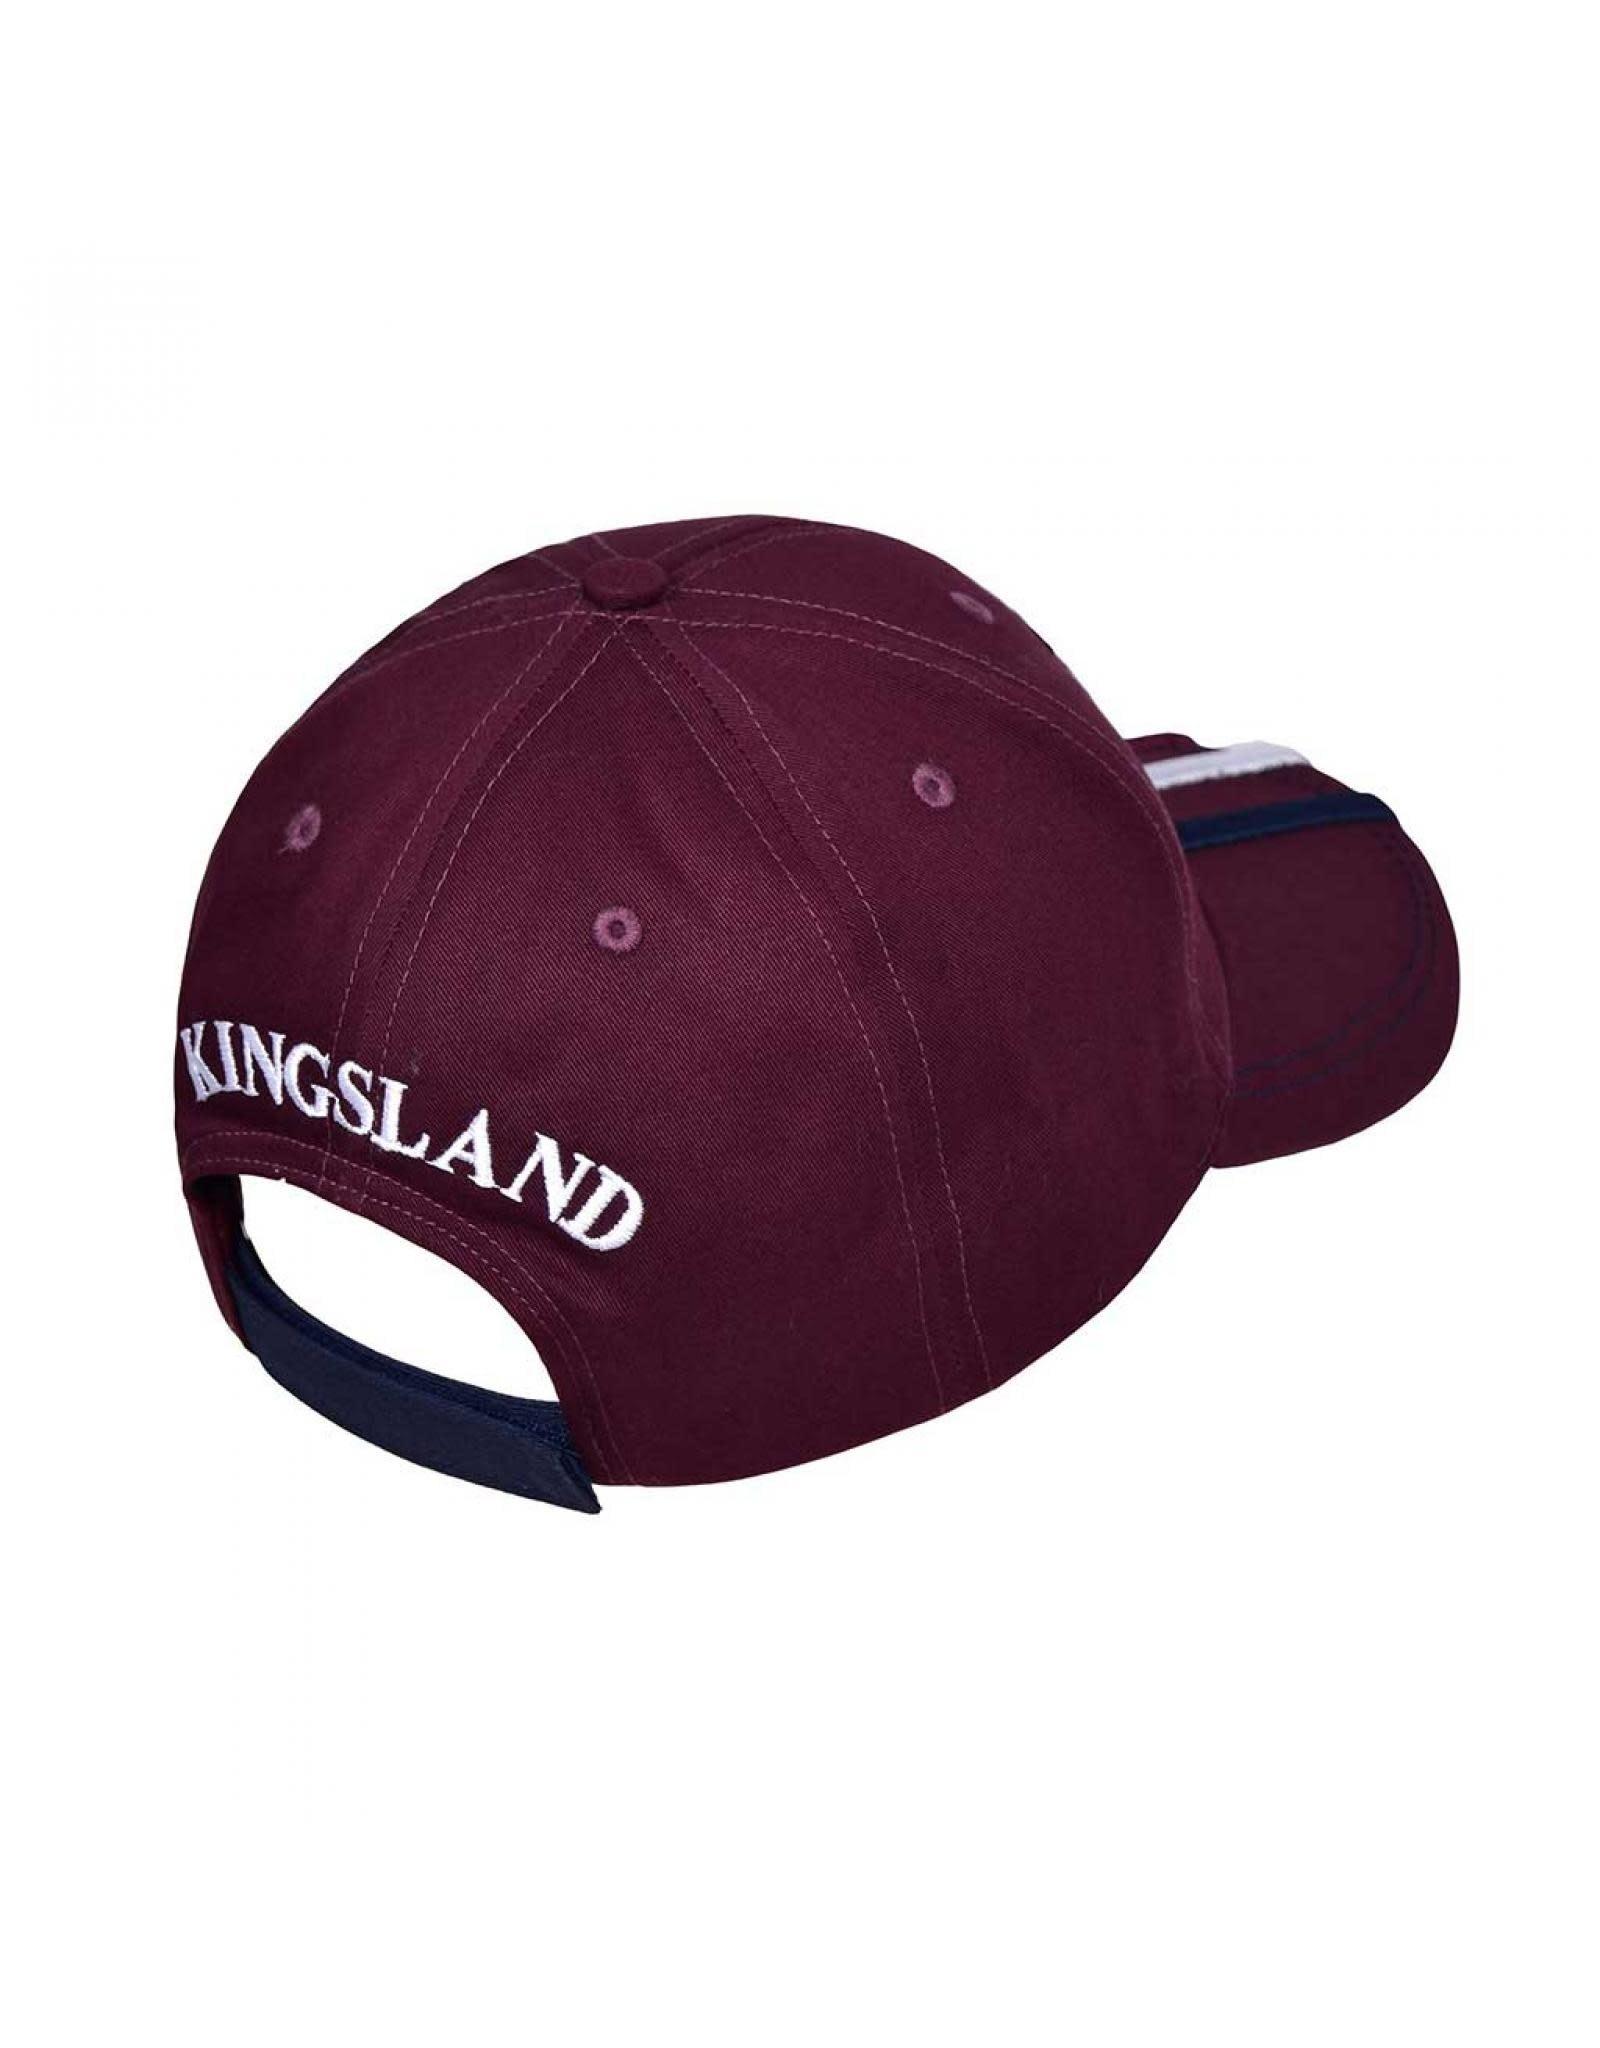 Kingsland KL Pet Jaden Burgundy